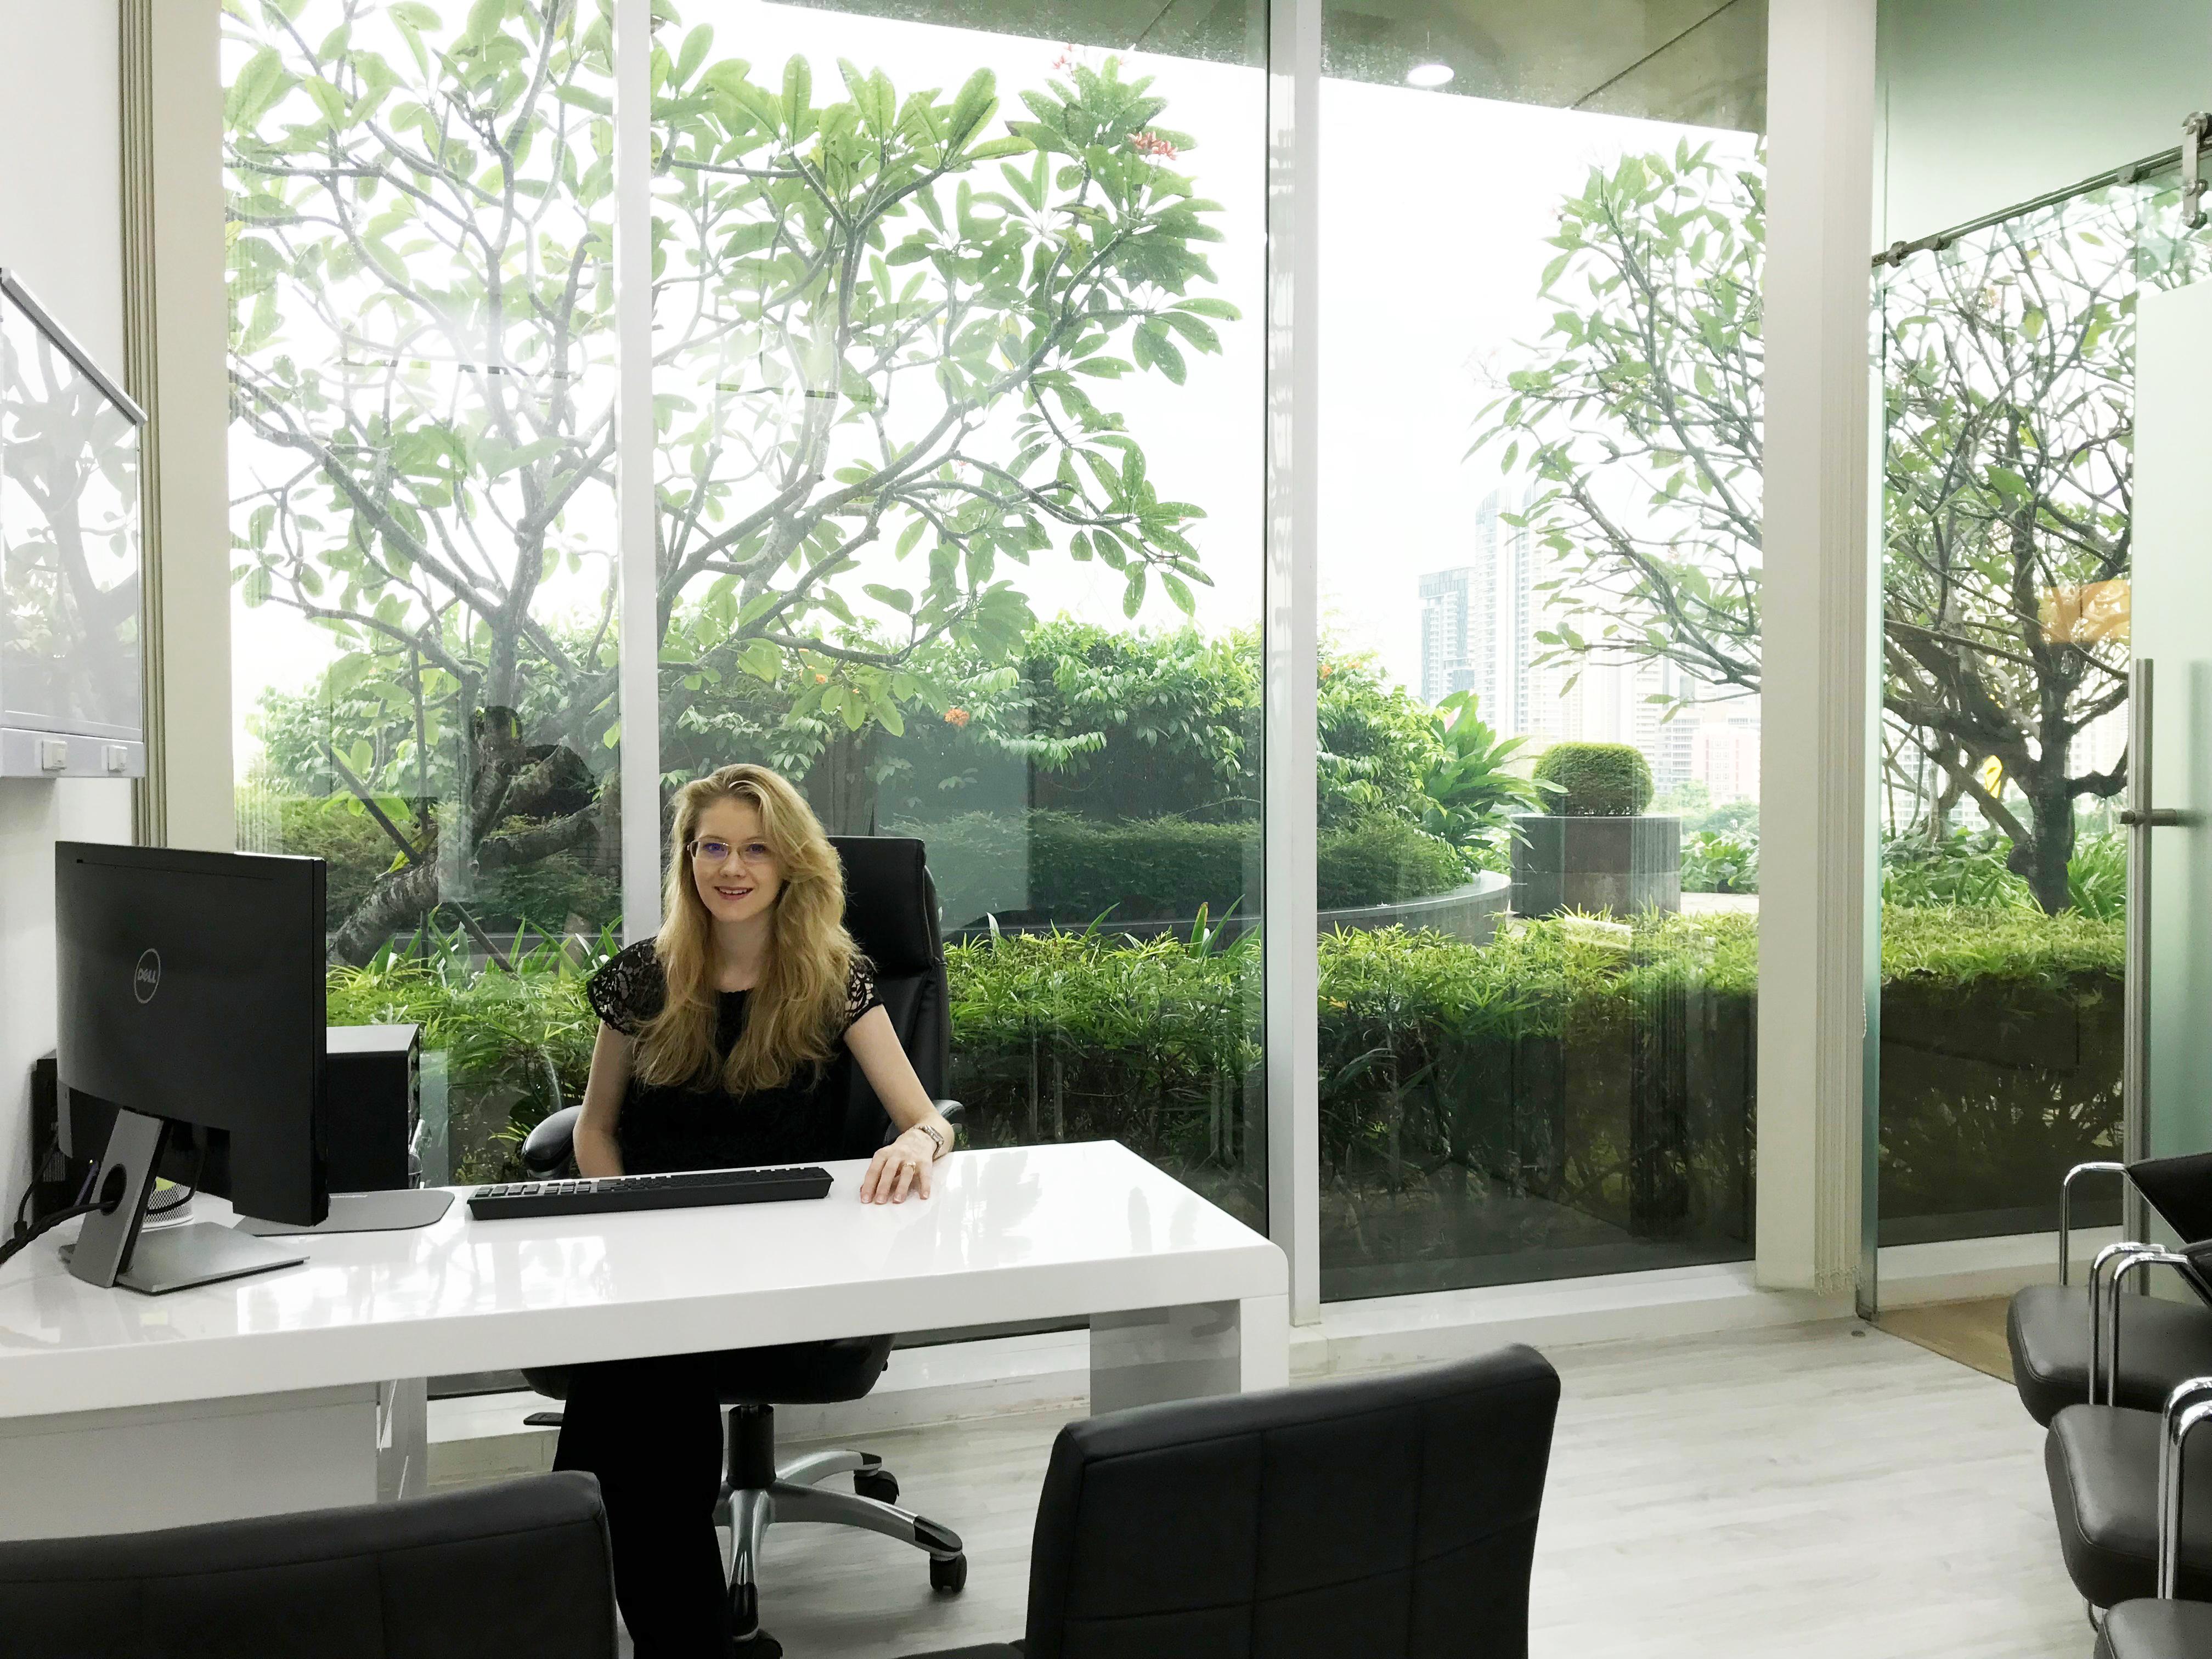 Singapore girl east coast handjob 5